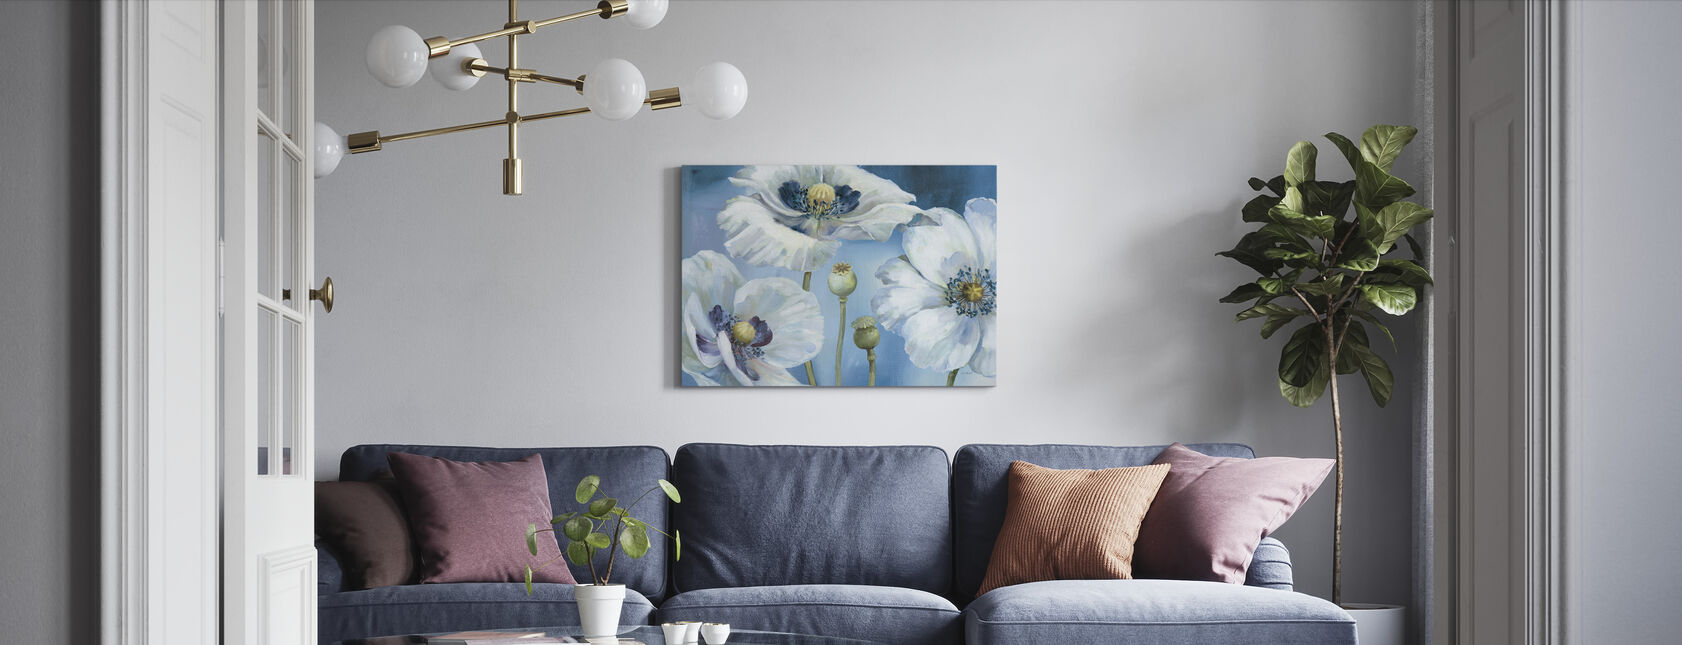 Blue Dance - Canvas print - Living Room